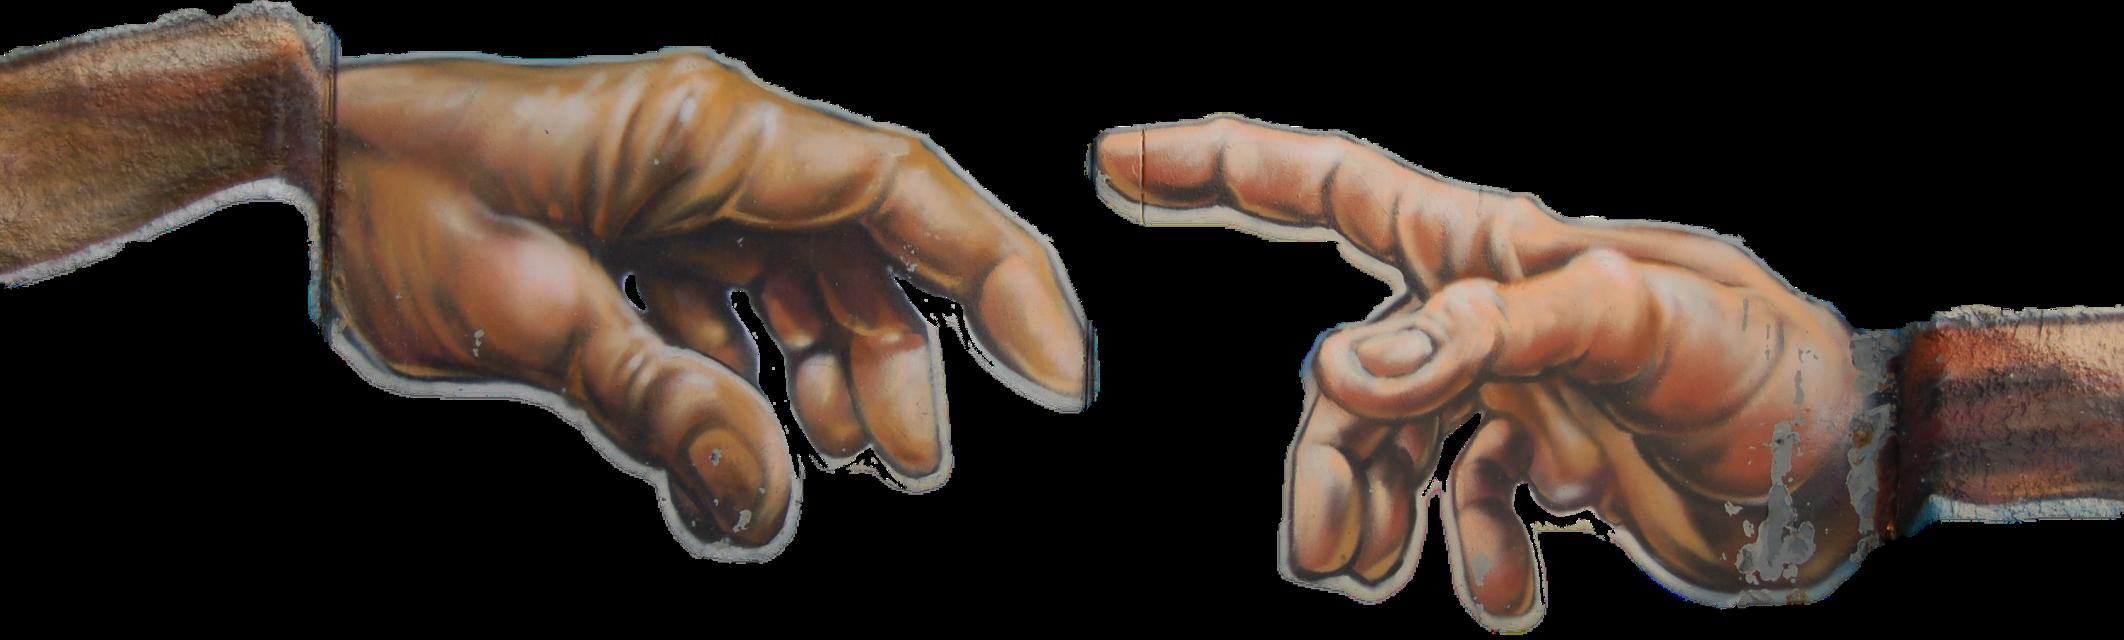 #FreeToEdit #ftestickers #hands